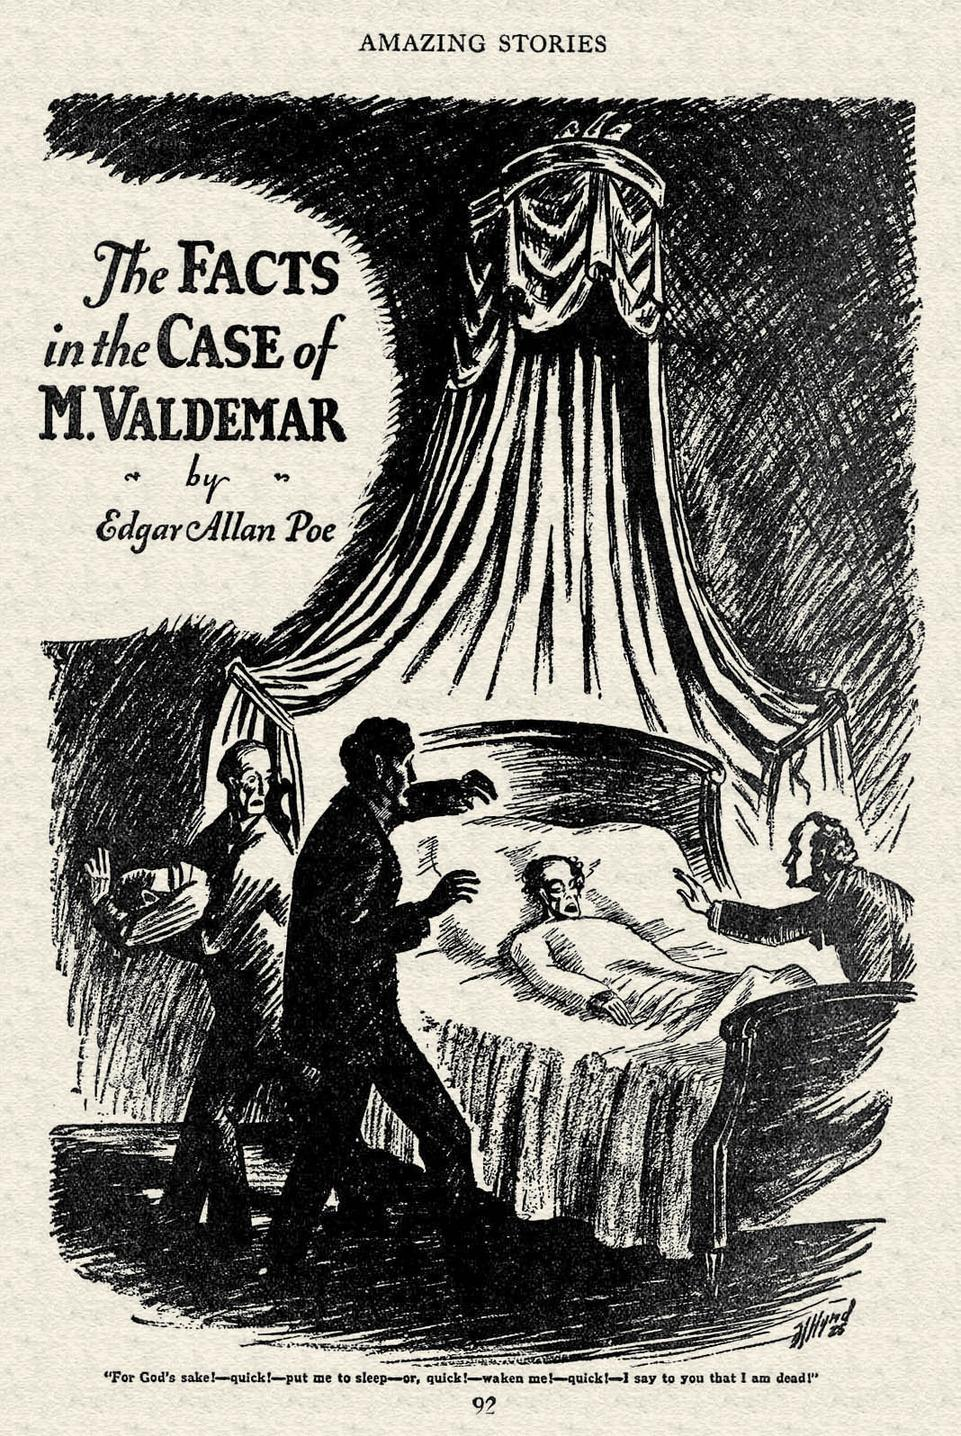 valdemar001-amazing-stories-vol-1-1.jpg